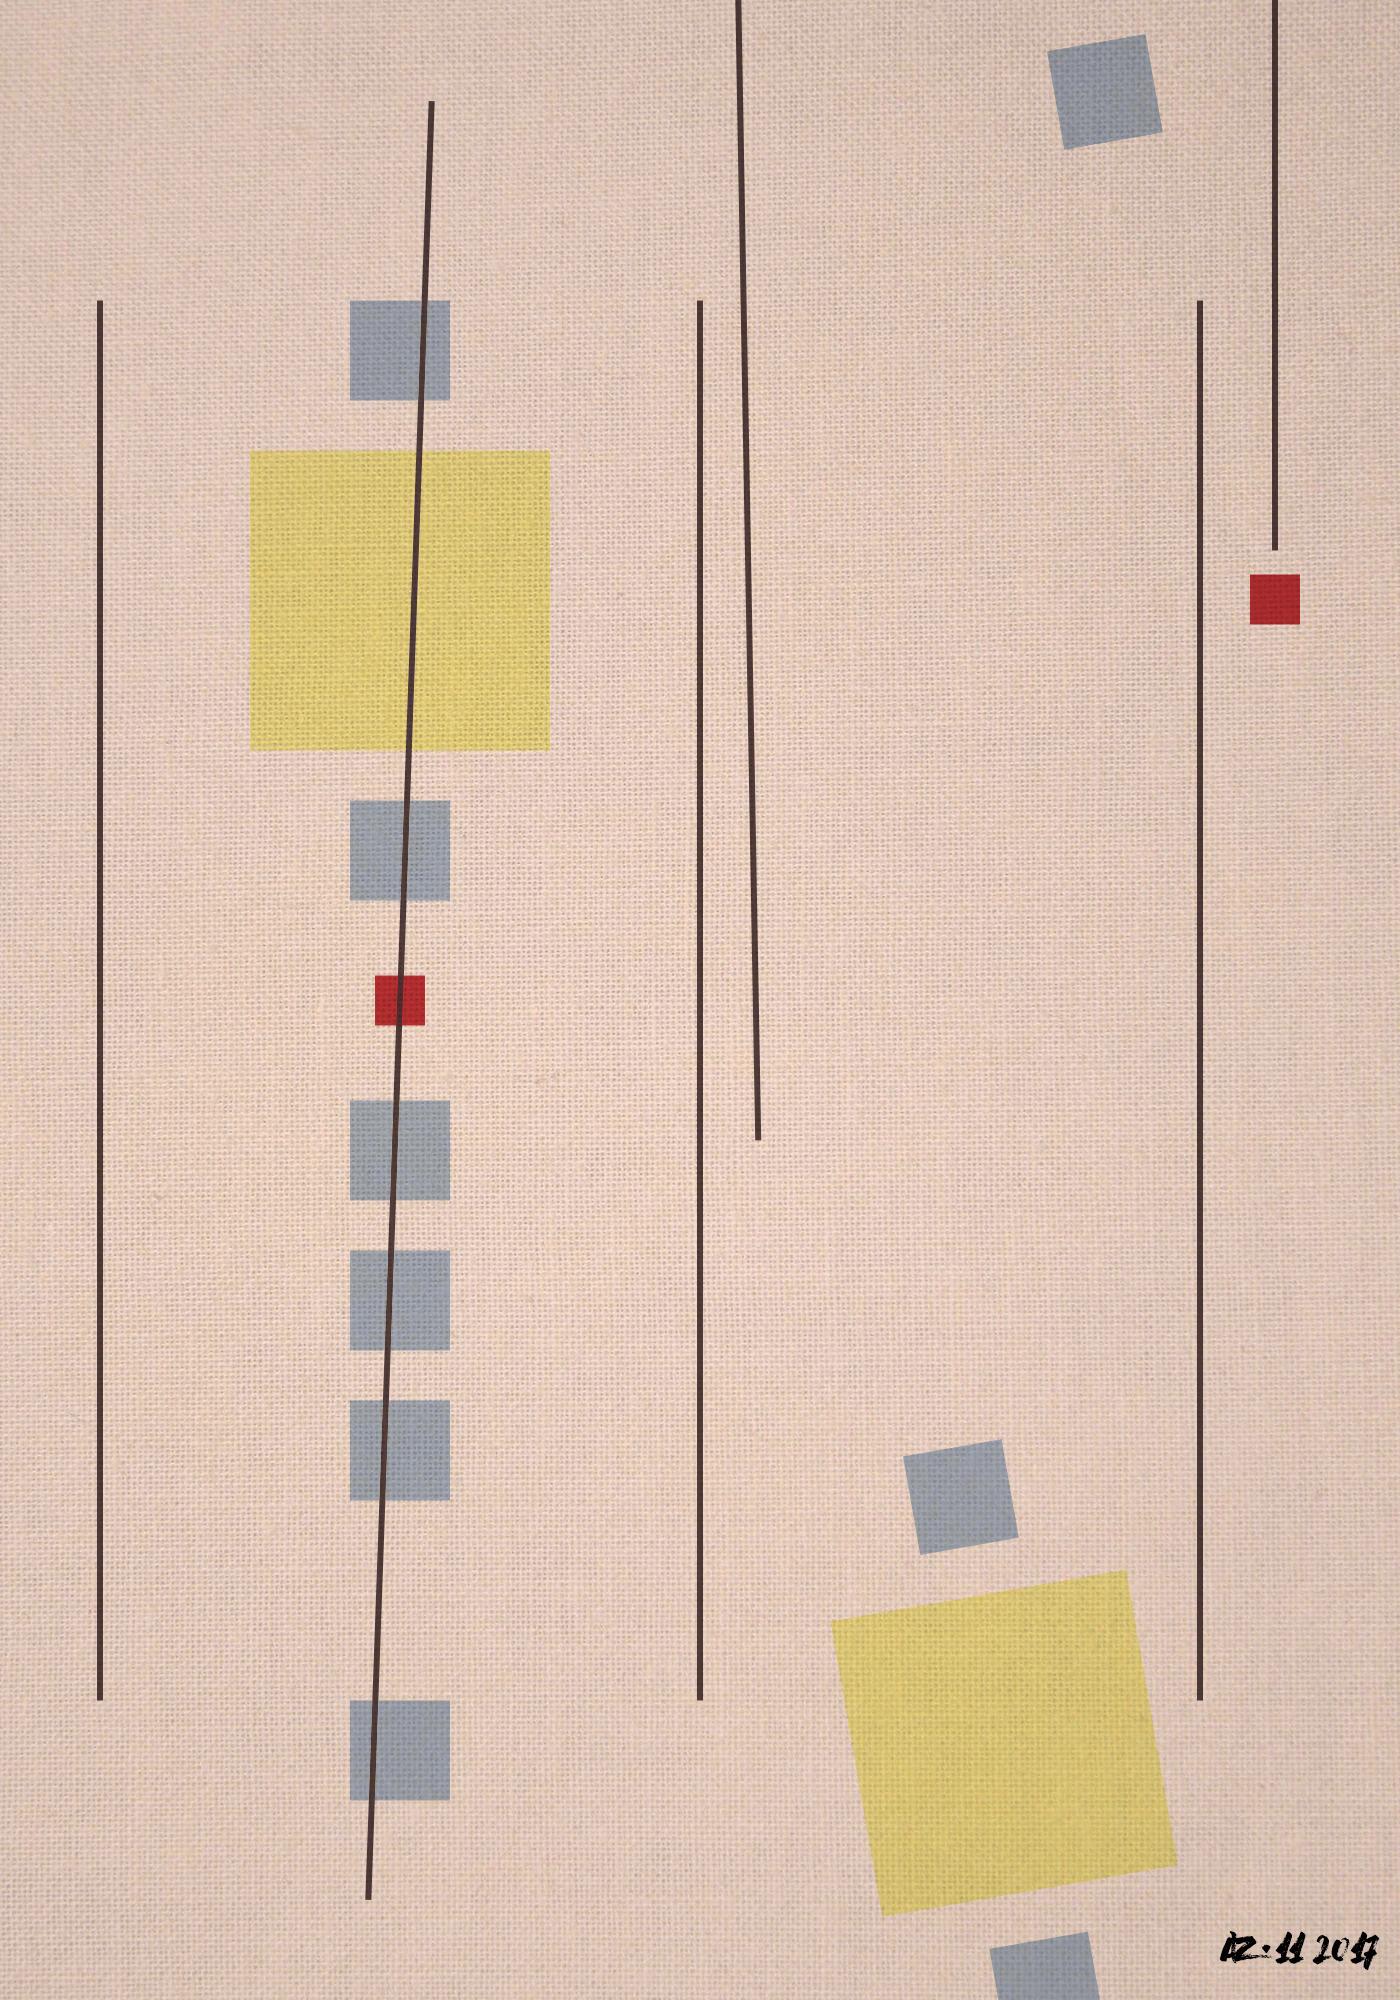 composition-32 - art, contemporary - gfgalli | ello